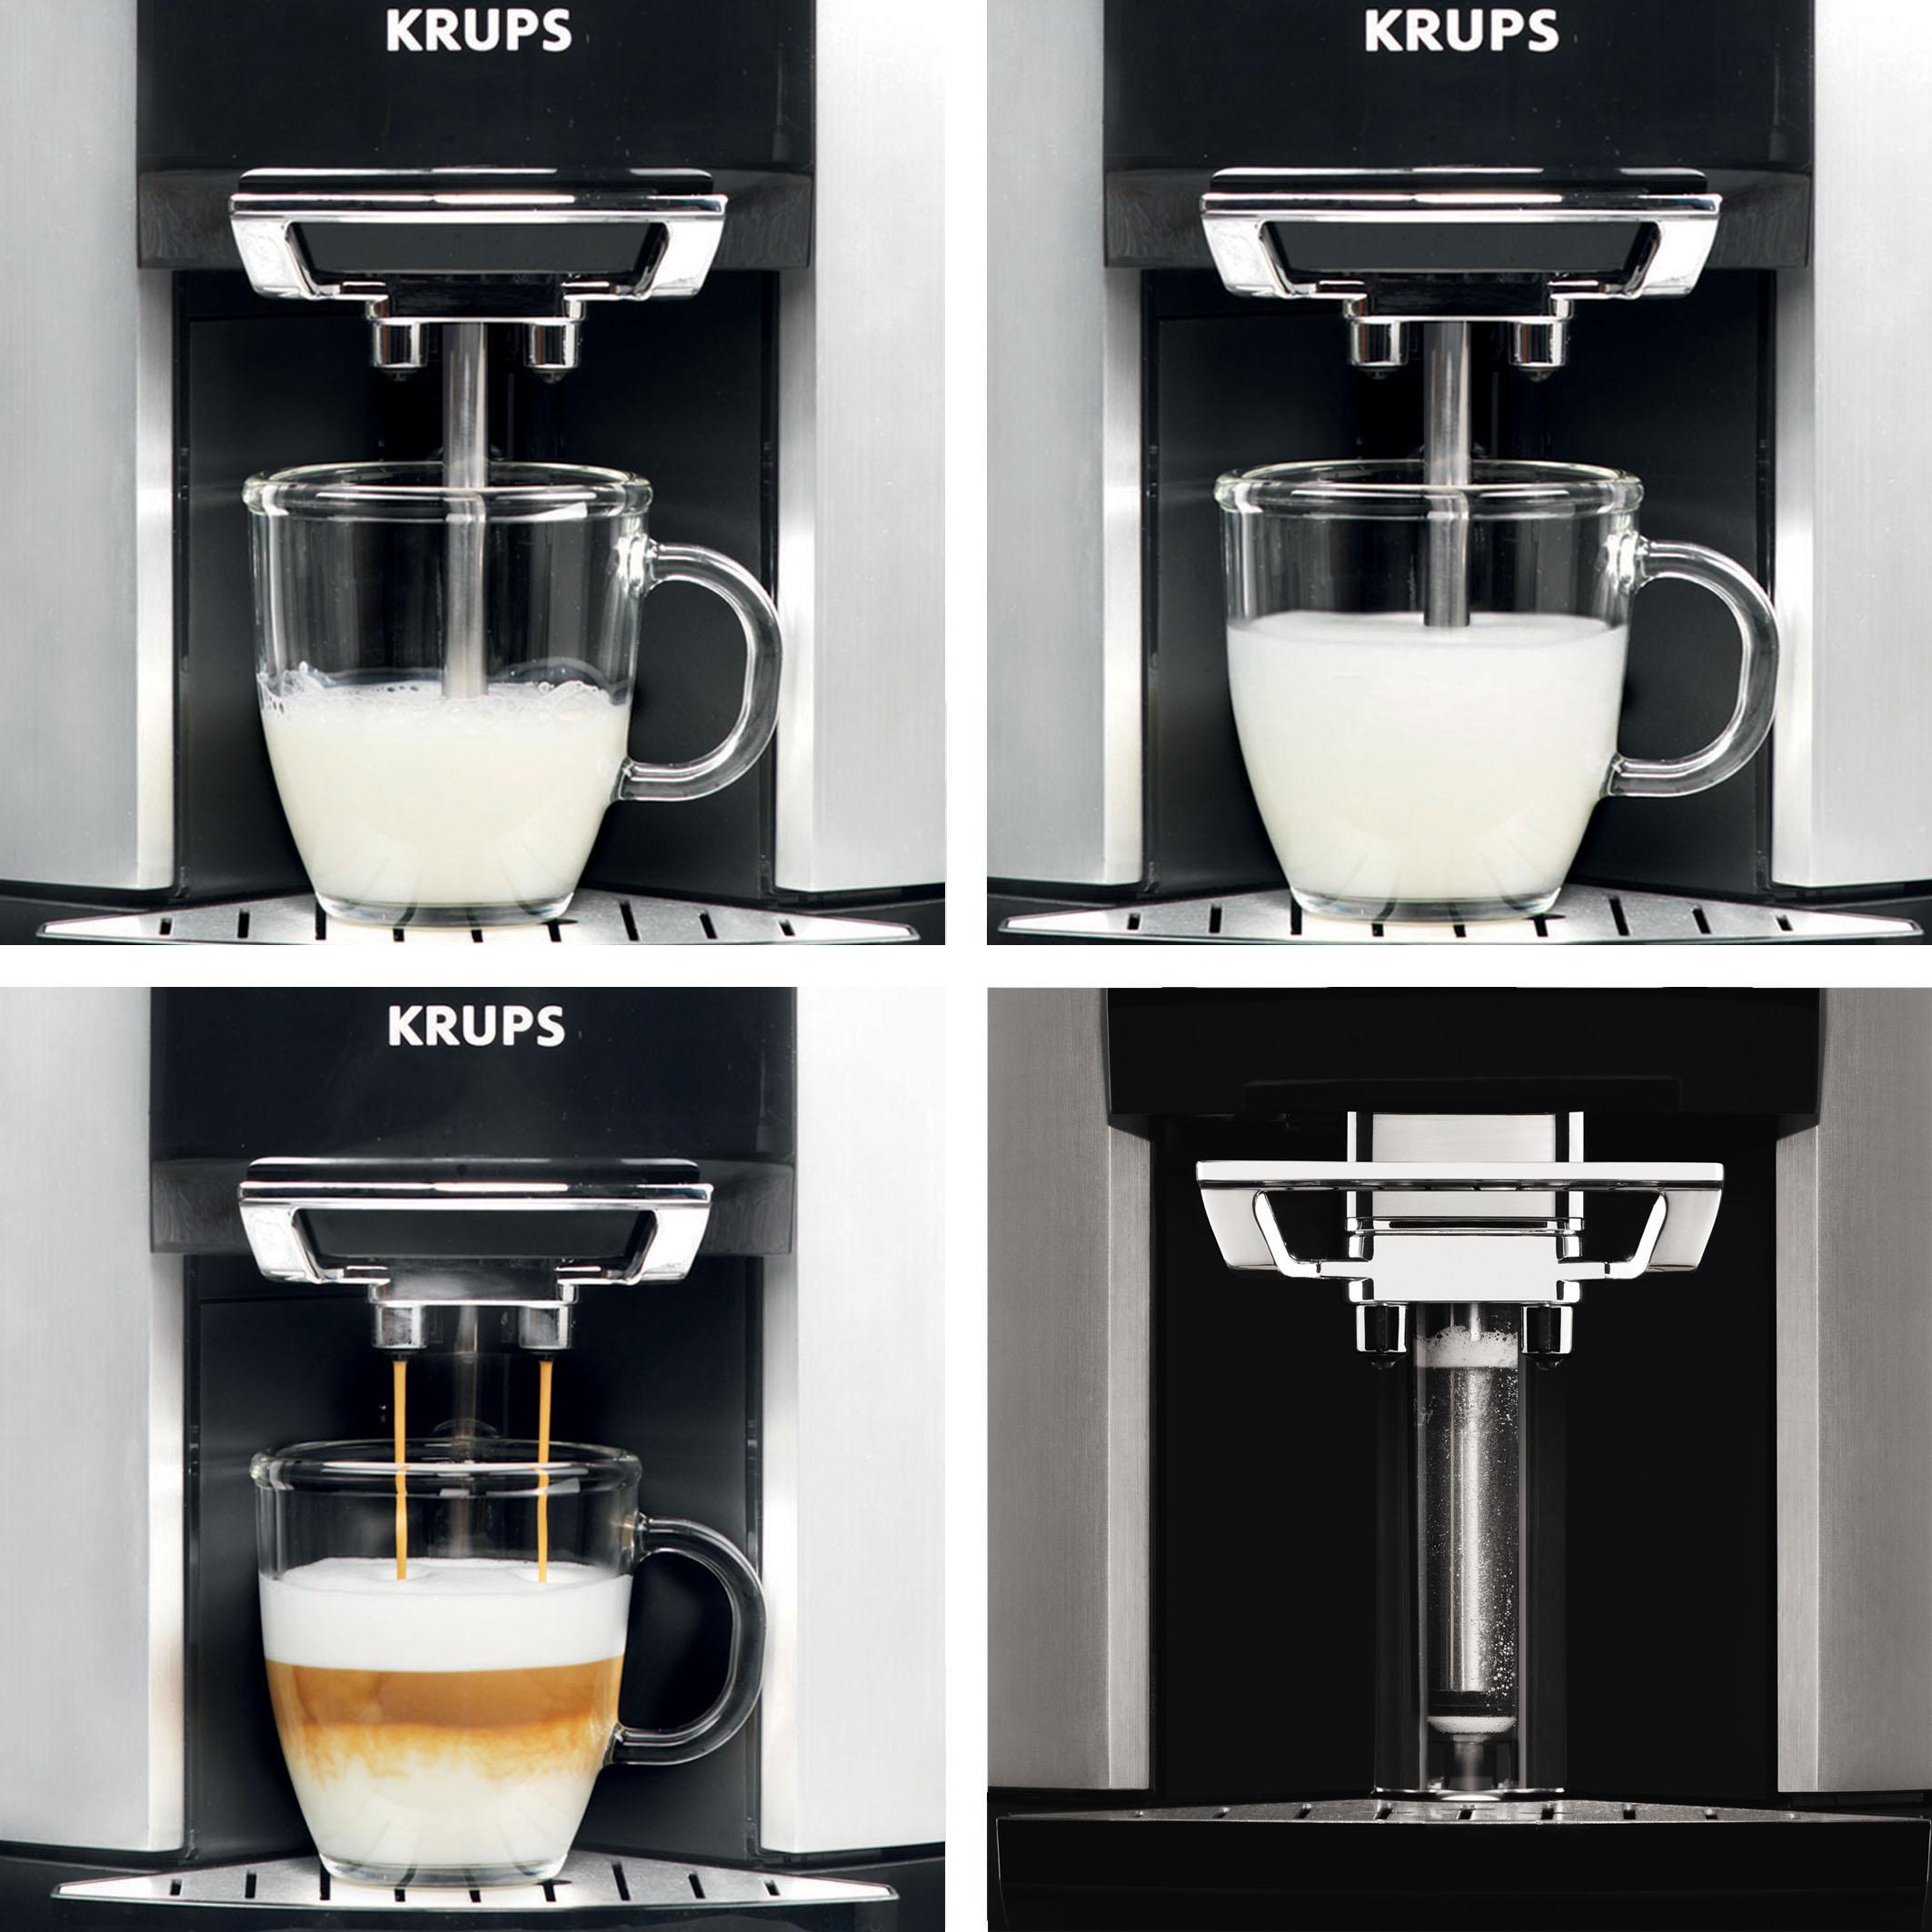 krups ea 9000 milchschaumvorgang krups ea 9000 kaffeevollautomat mit one touch bedienung. Black Bedroom Furniture Sets. Home Design Ideas